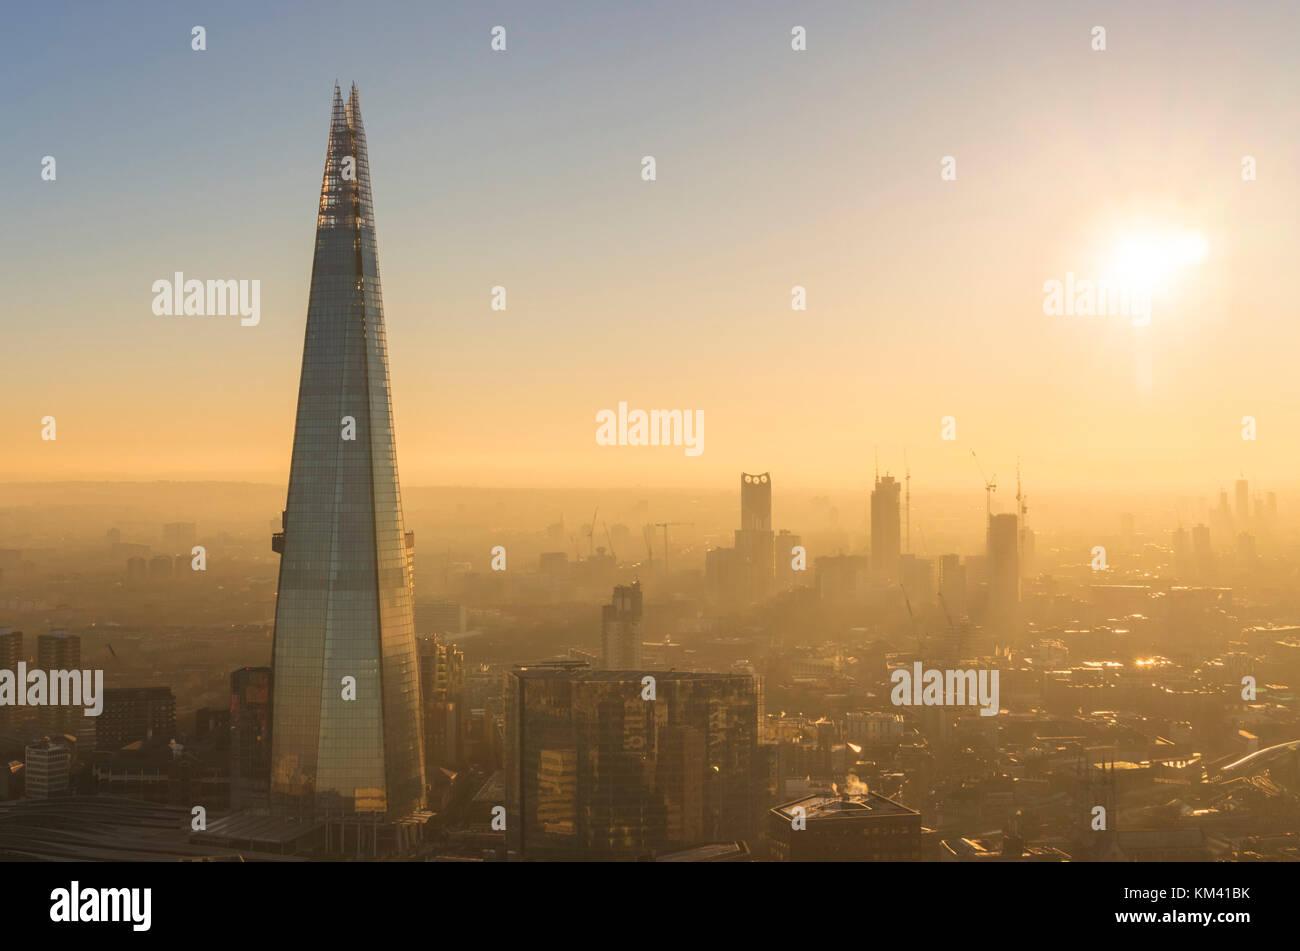 Der Shard London England London Uk gb eu Europa der Shard London London England UK gb eu Europa Stockbild